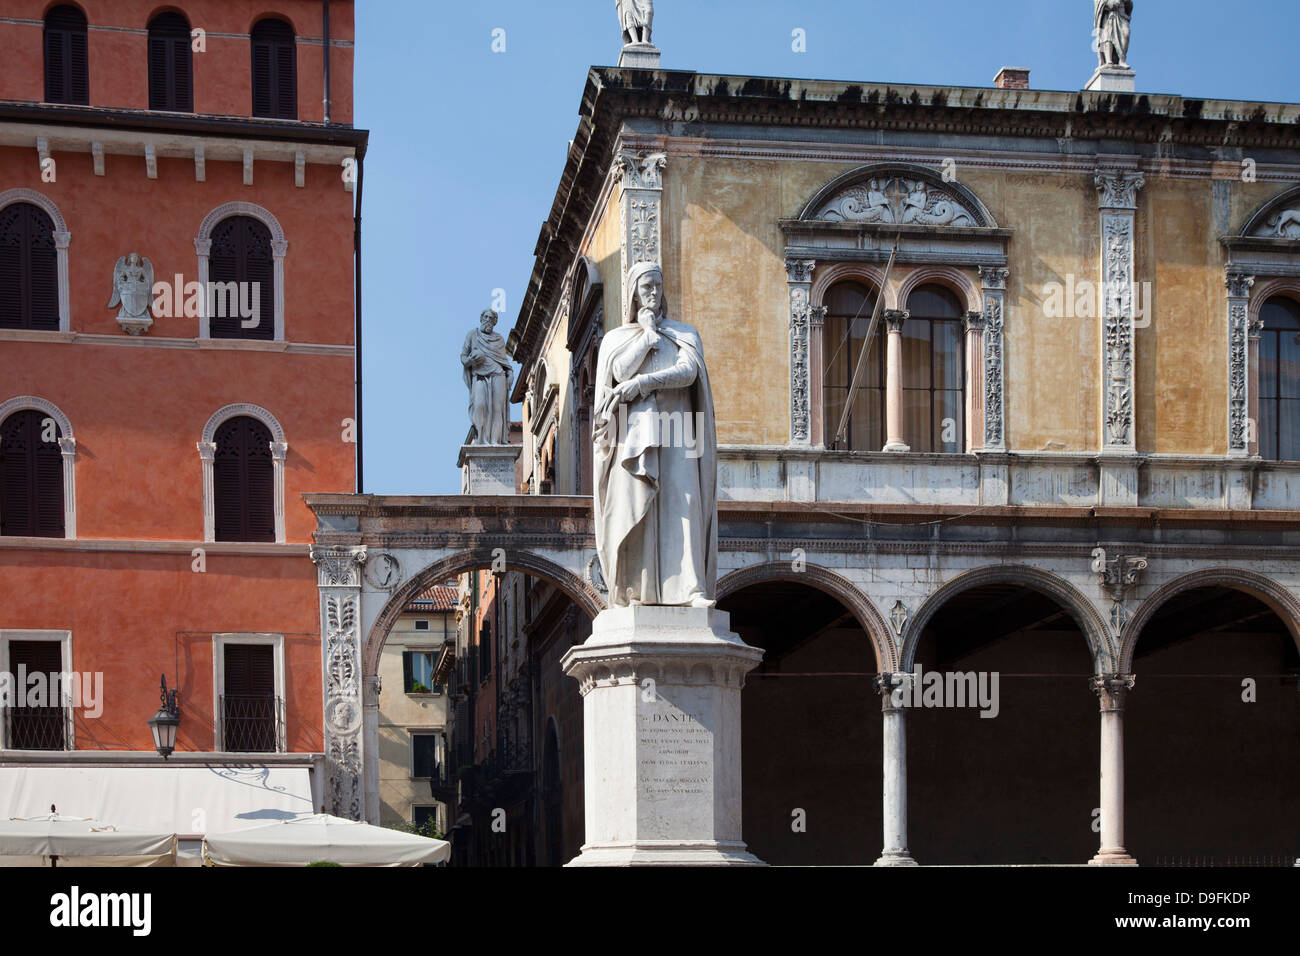 Statue of Dante, Verona, UNESCO World Heritage Site, Veneto, Italy Stock Photo